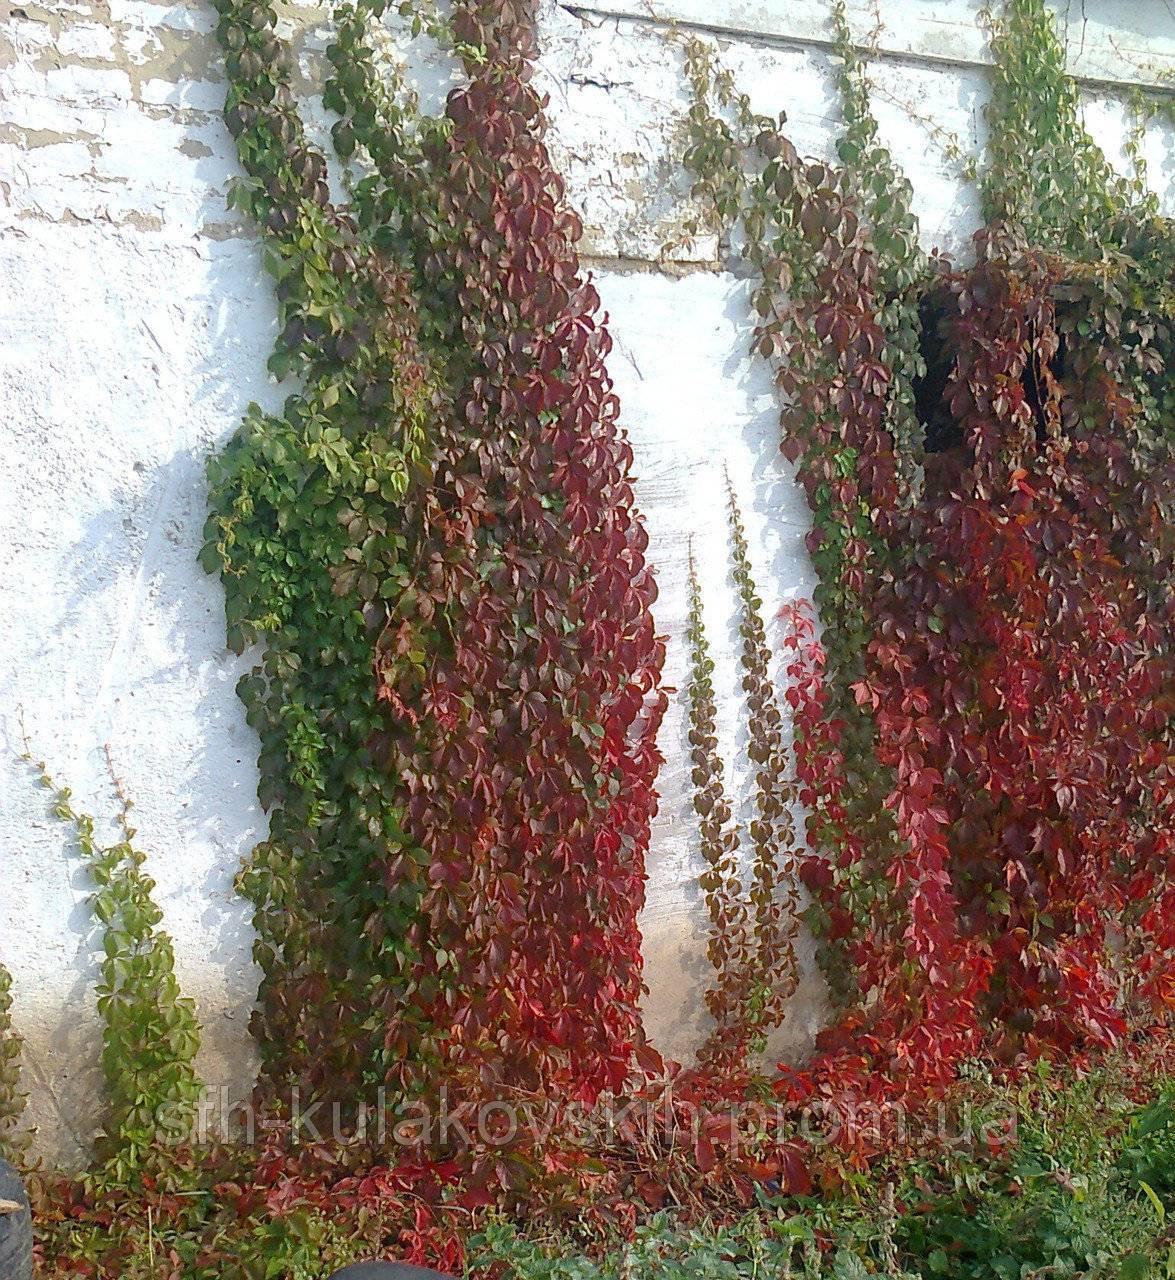 Виноград вичи: размножение черенками, характеристики, борьба с вредителями, описание и фото